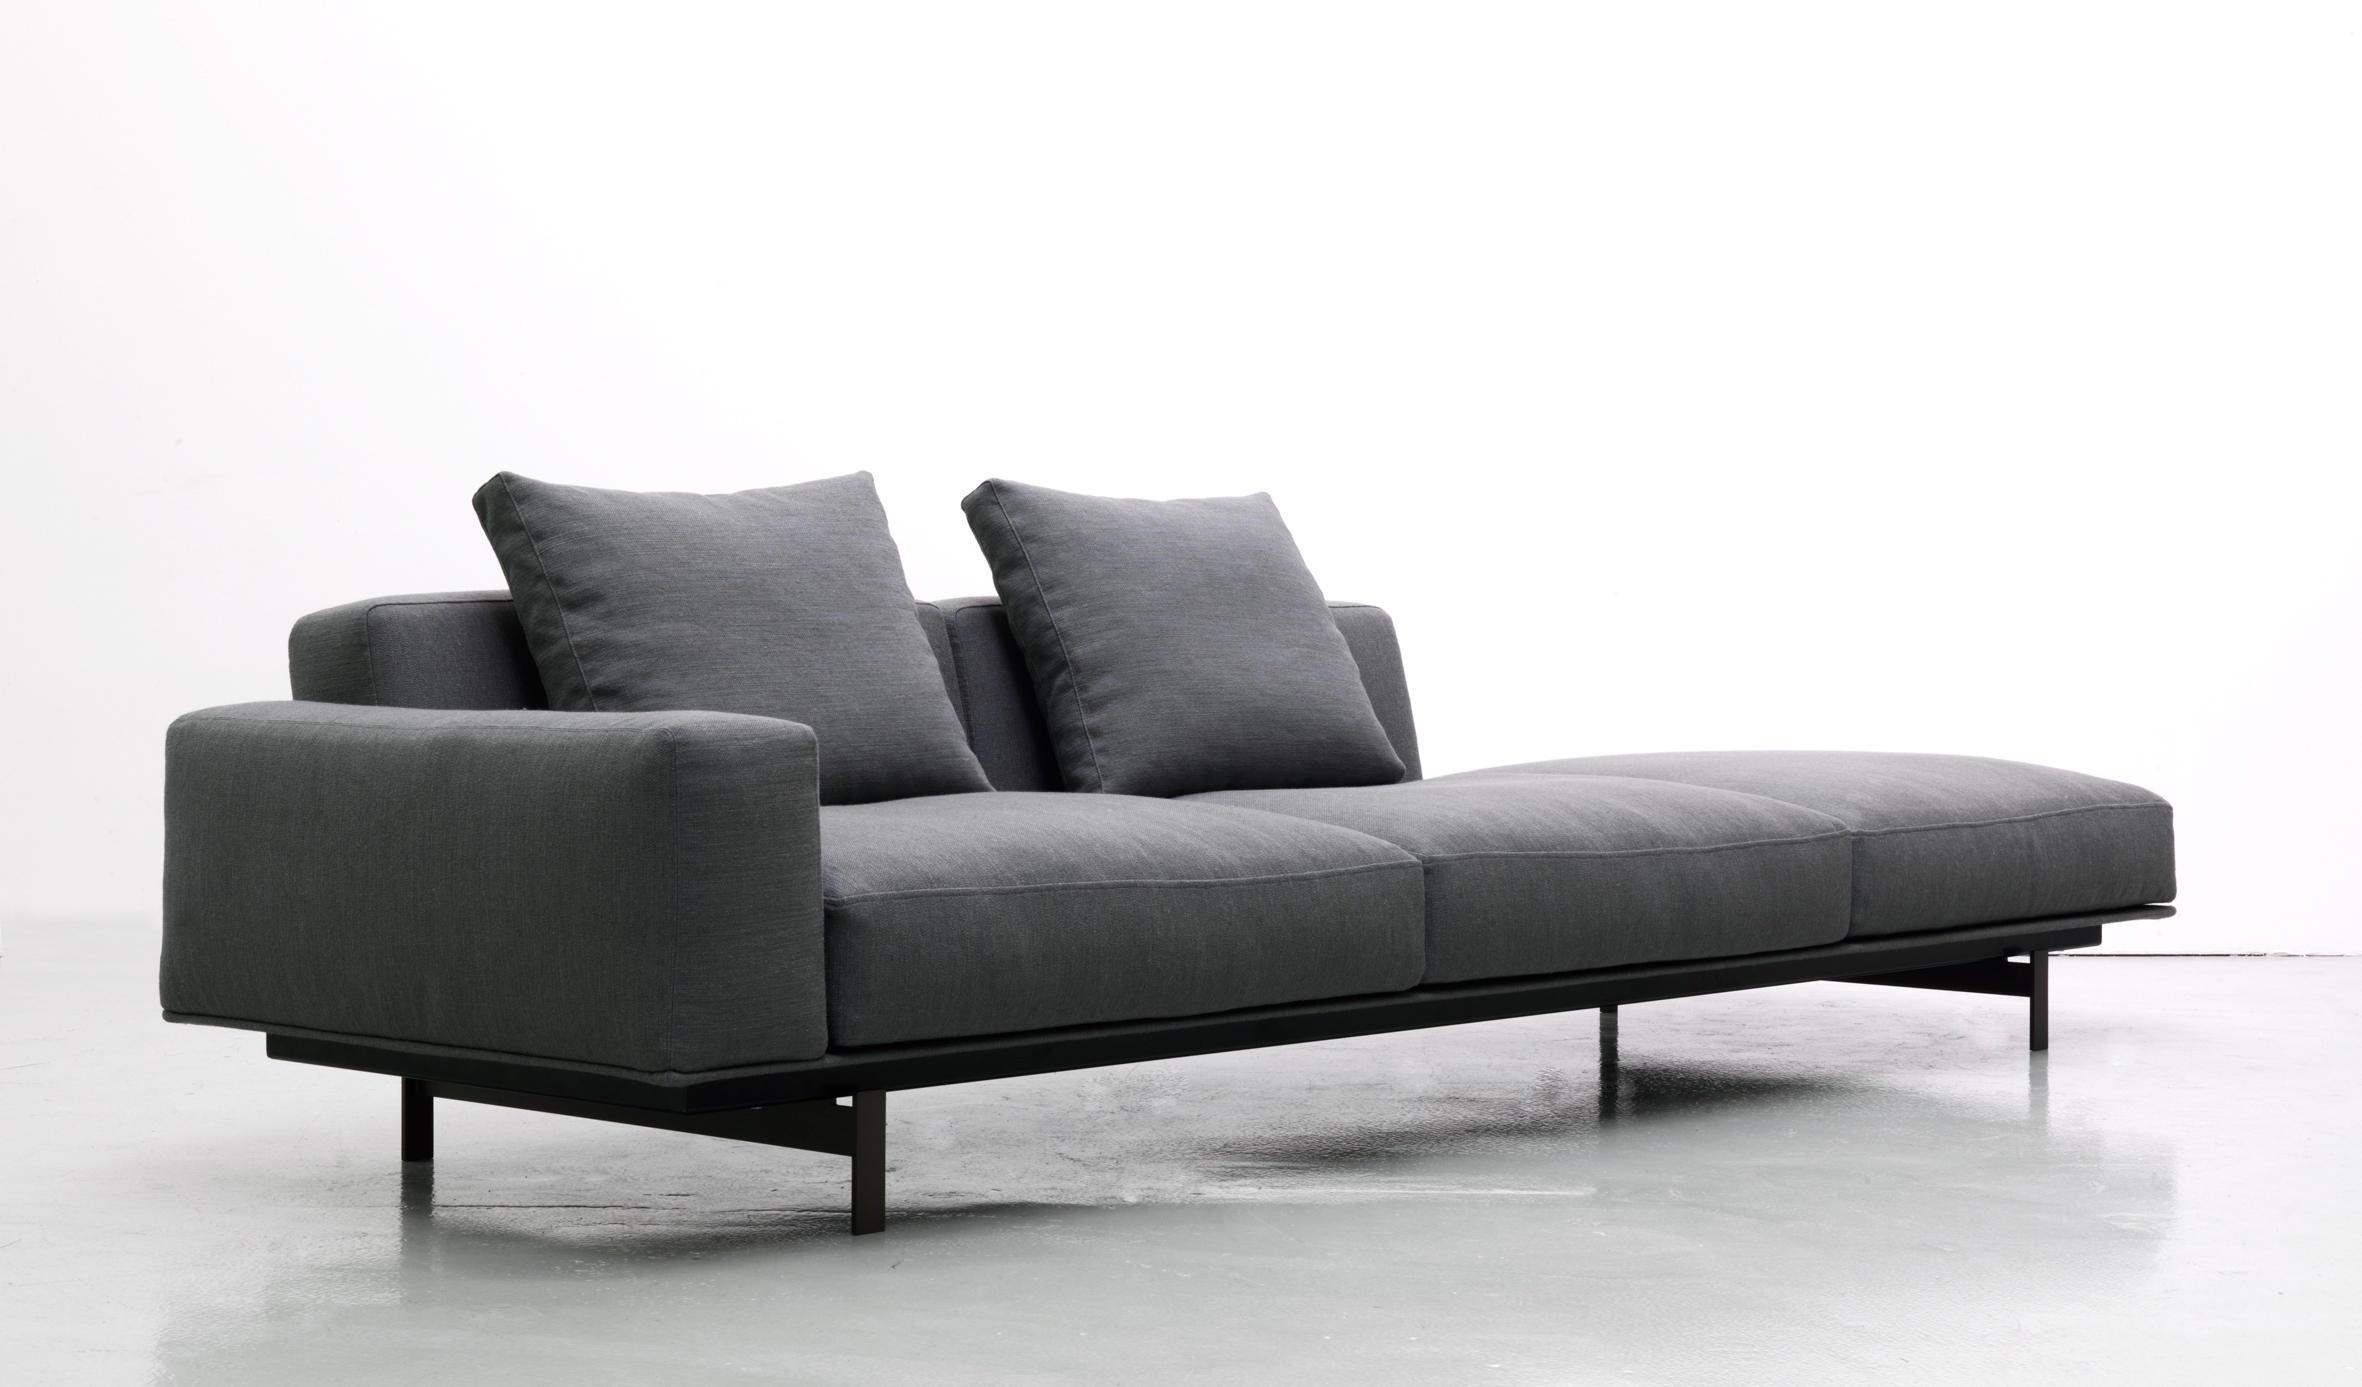 Big sofa abverkauf for Ausstellungsstucke sofa